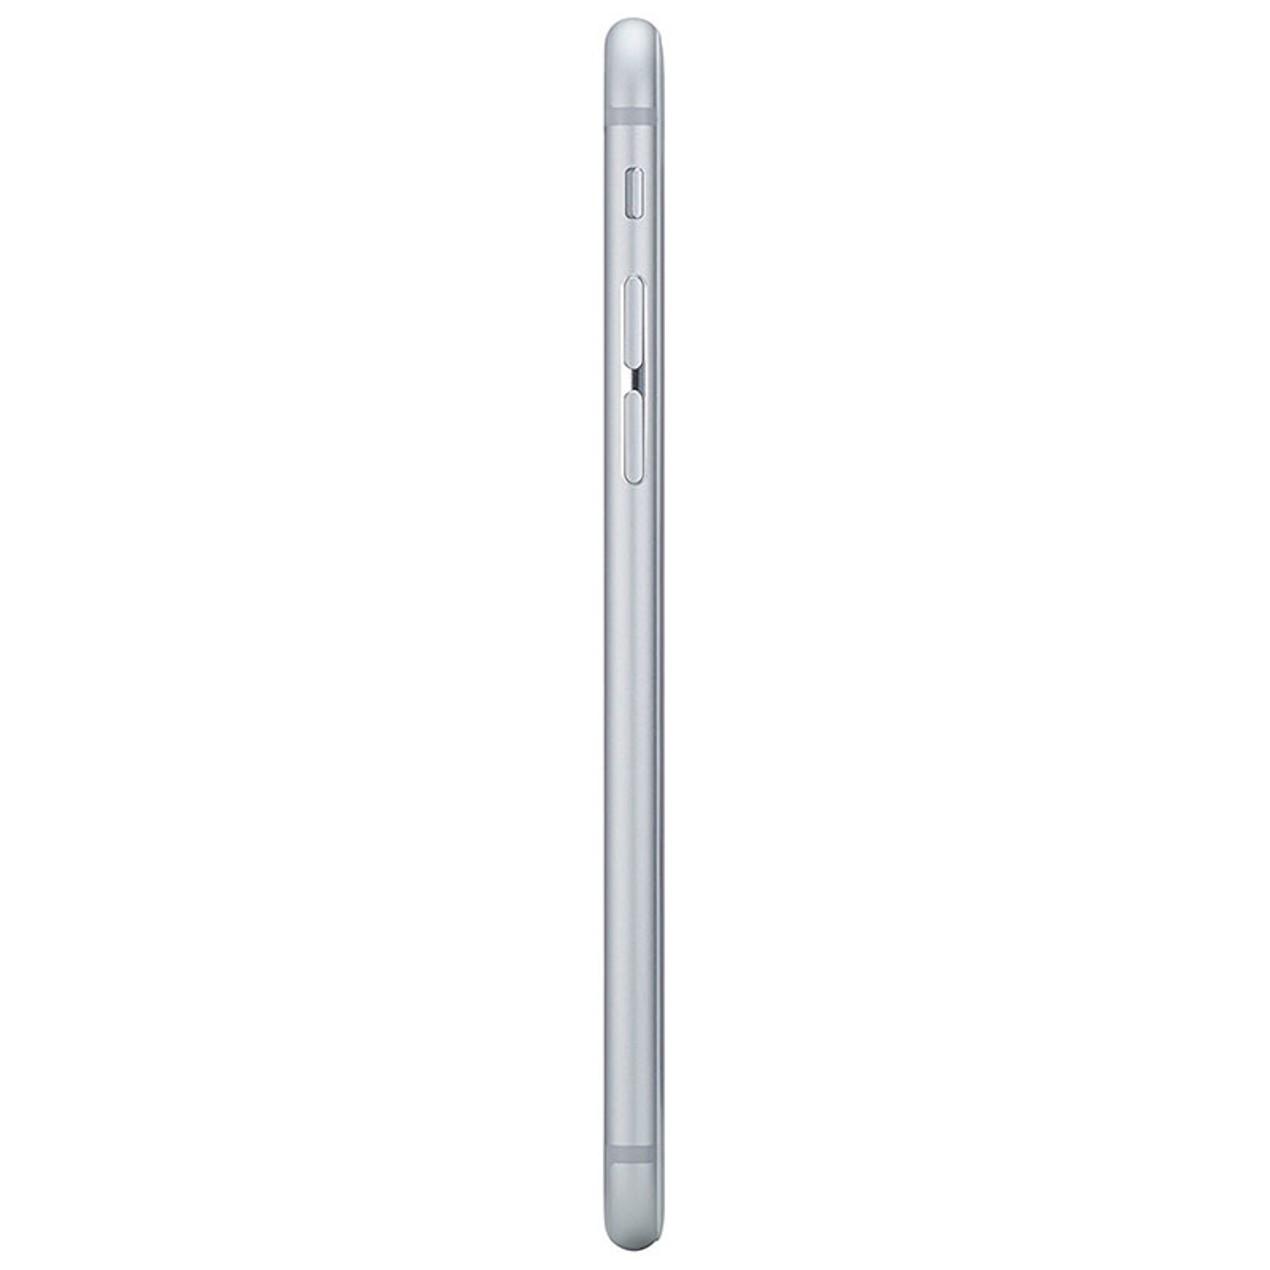 Apple Iphone 6 64gb Gsm Unlocked Black Gold Or Silver Tanga